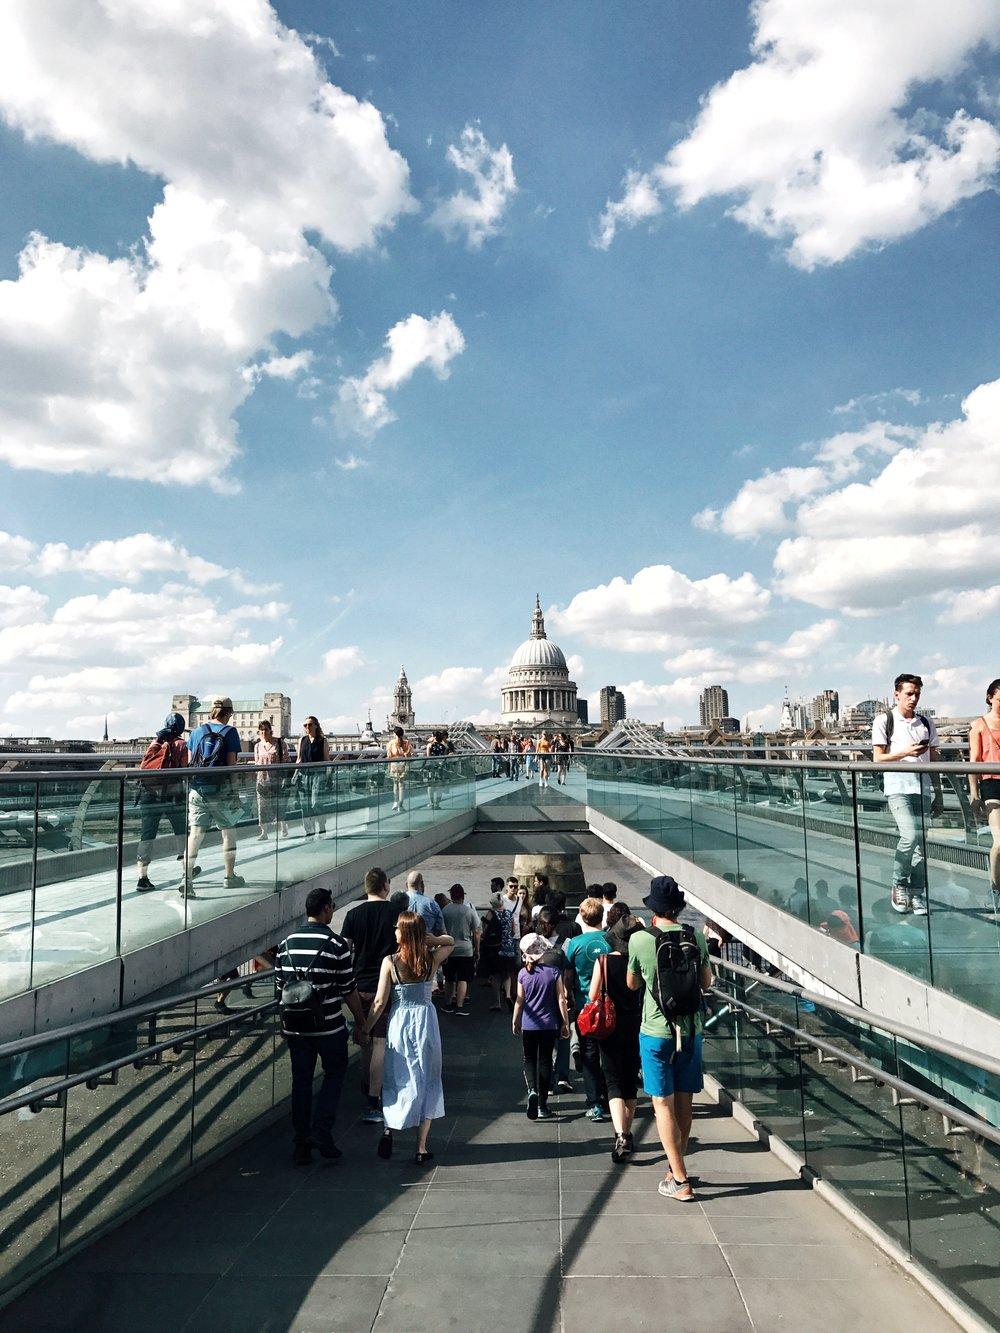 Walking over the bridge to Tate Modern